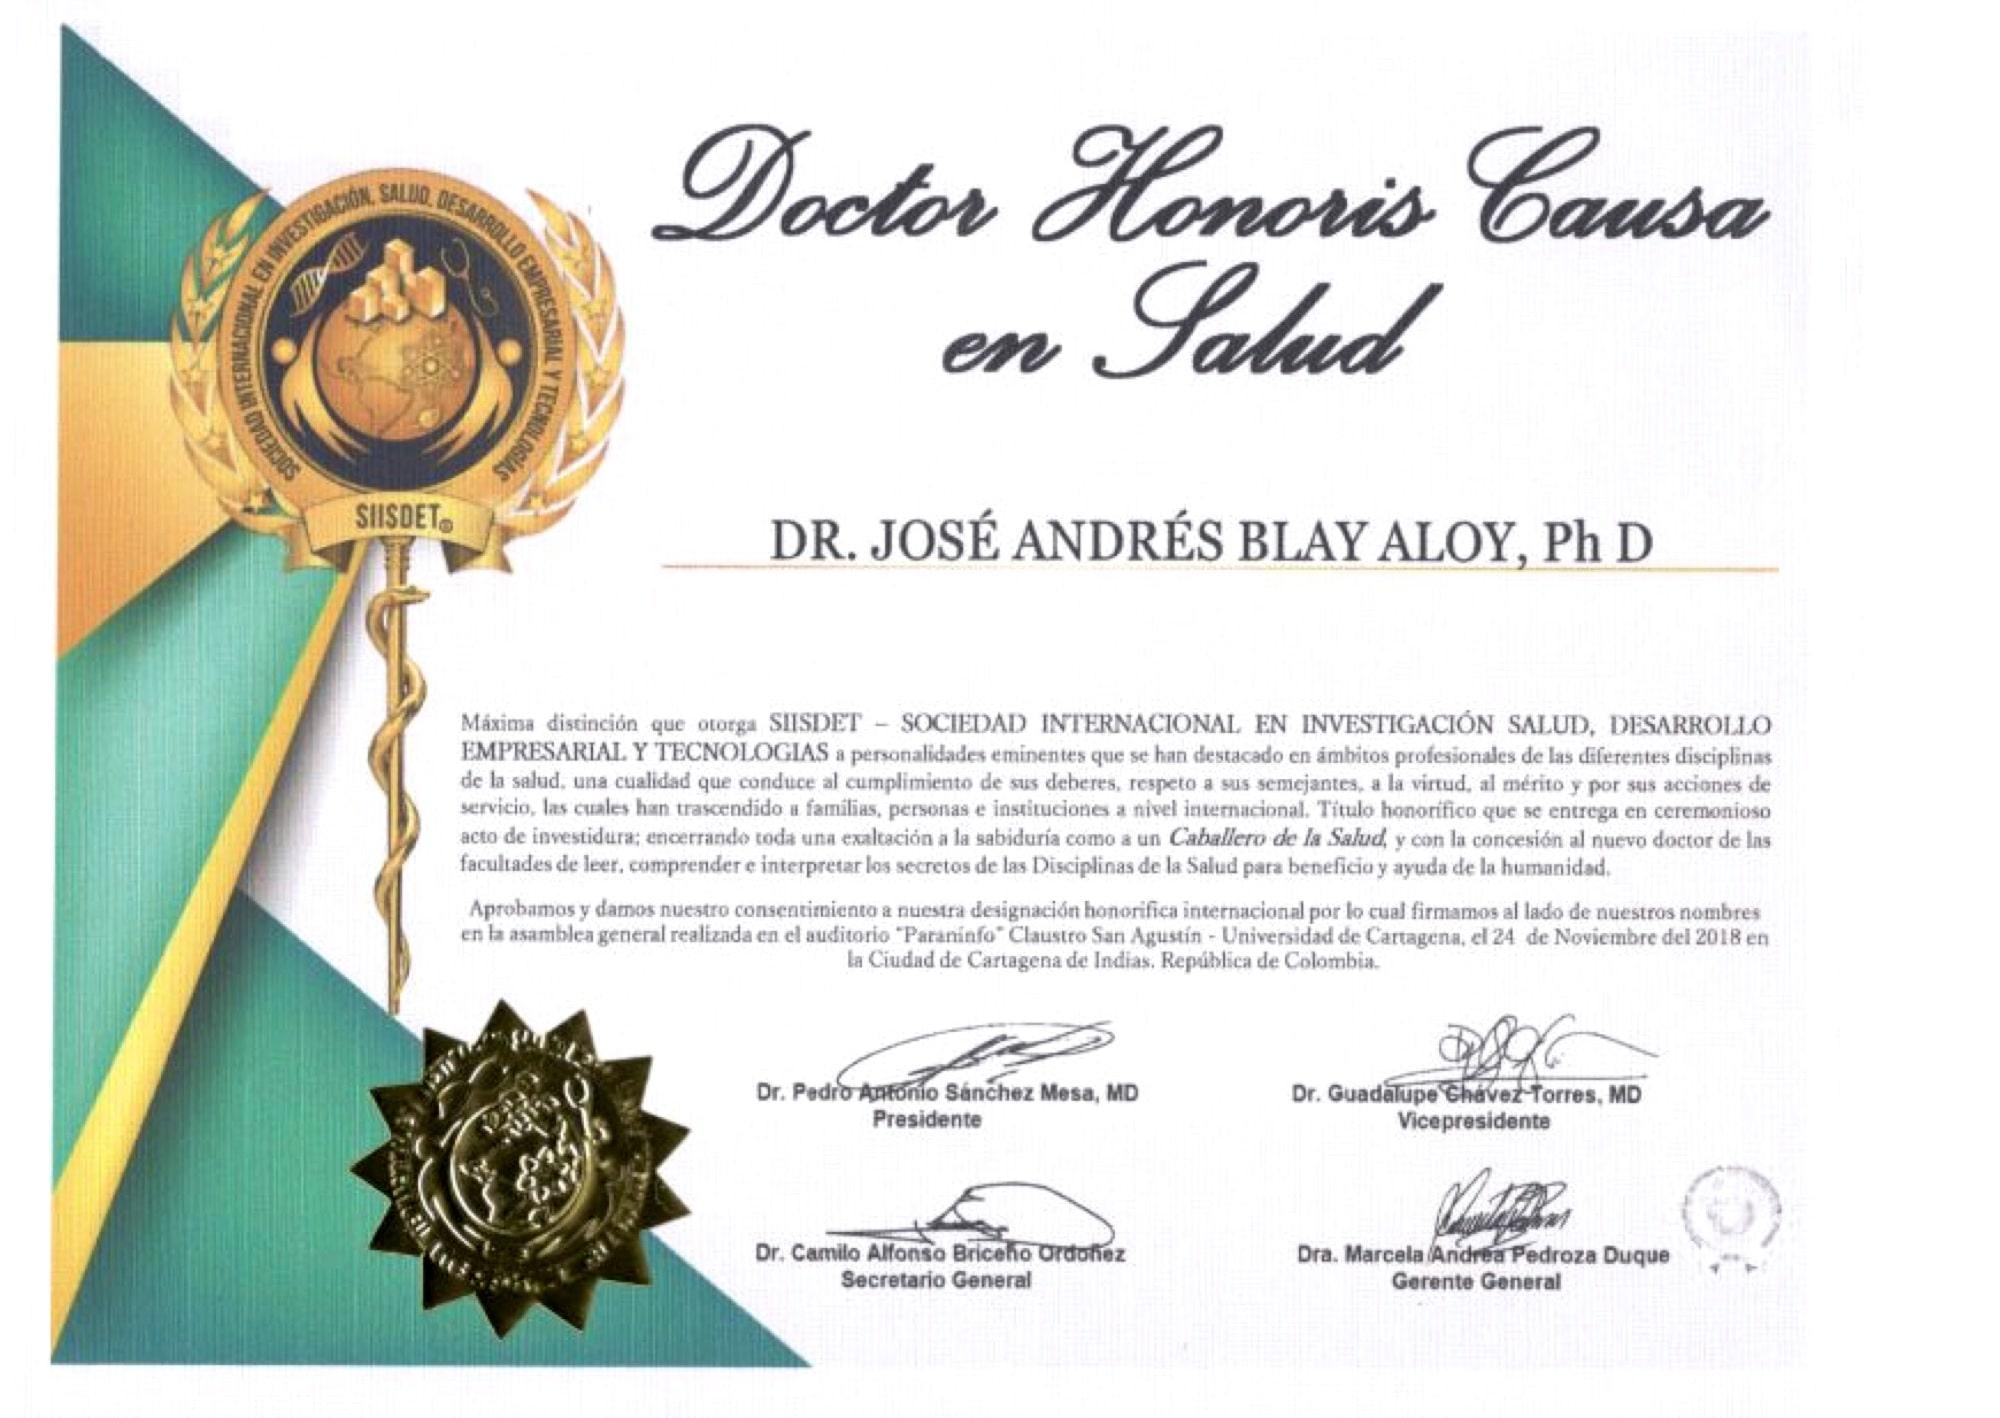 Doctor Honoris Causa en Salud Jose Andres Blay Aloy